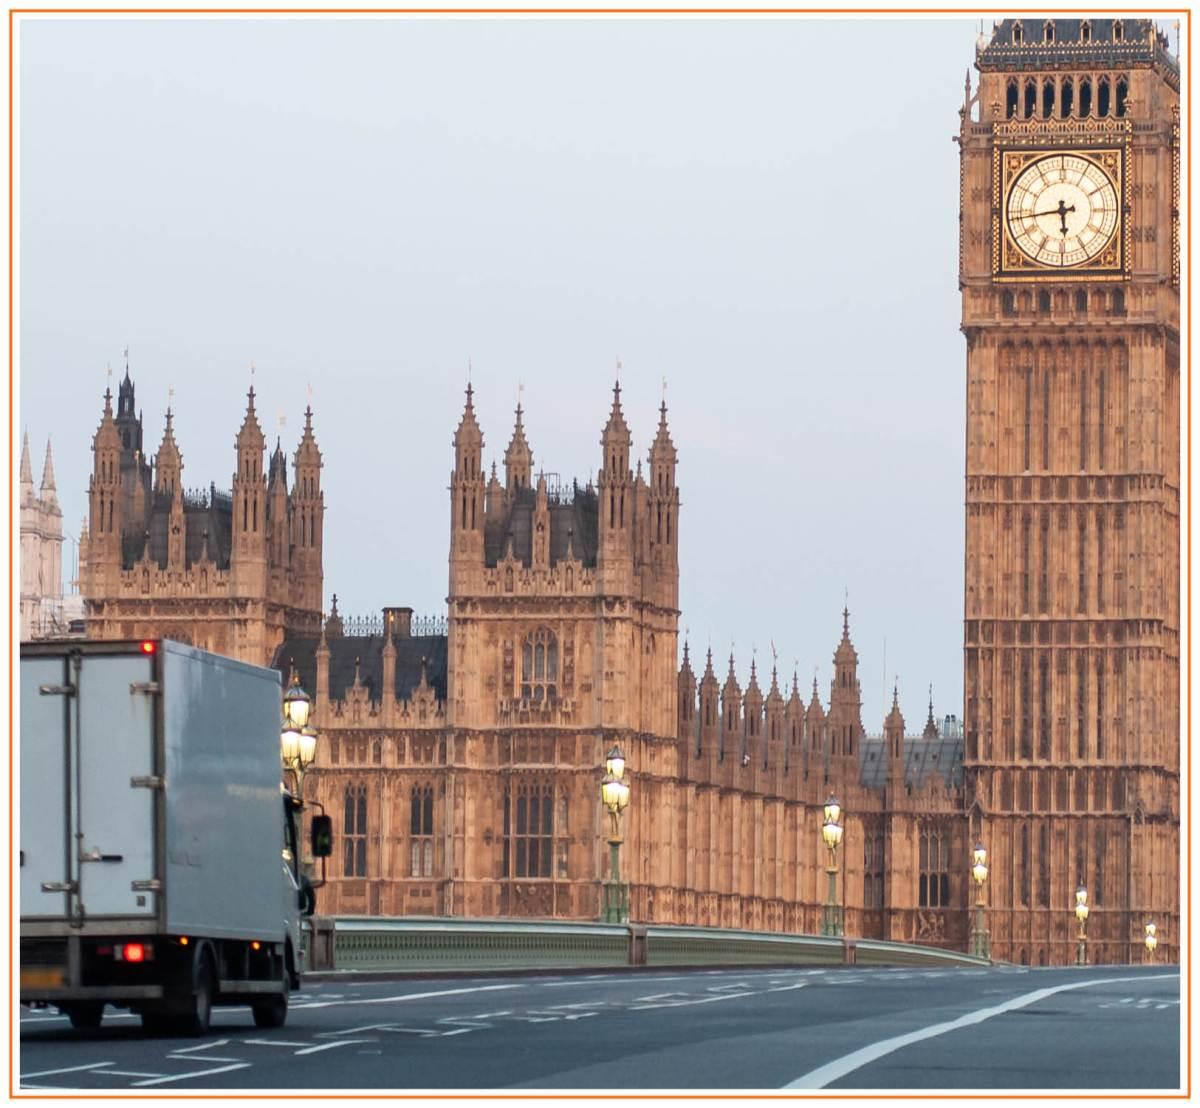 https://i1.wp.com/haultech.co.uk/wp-content/uploads/2021/06/Transport-for-London-Issue-more-than-7000-Direct-Vision-Standard-Fines.jpg?fit=1200%2C1108&ssl=1